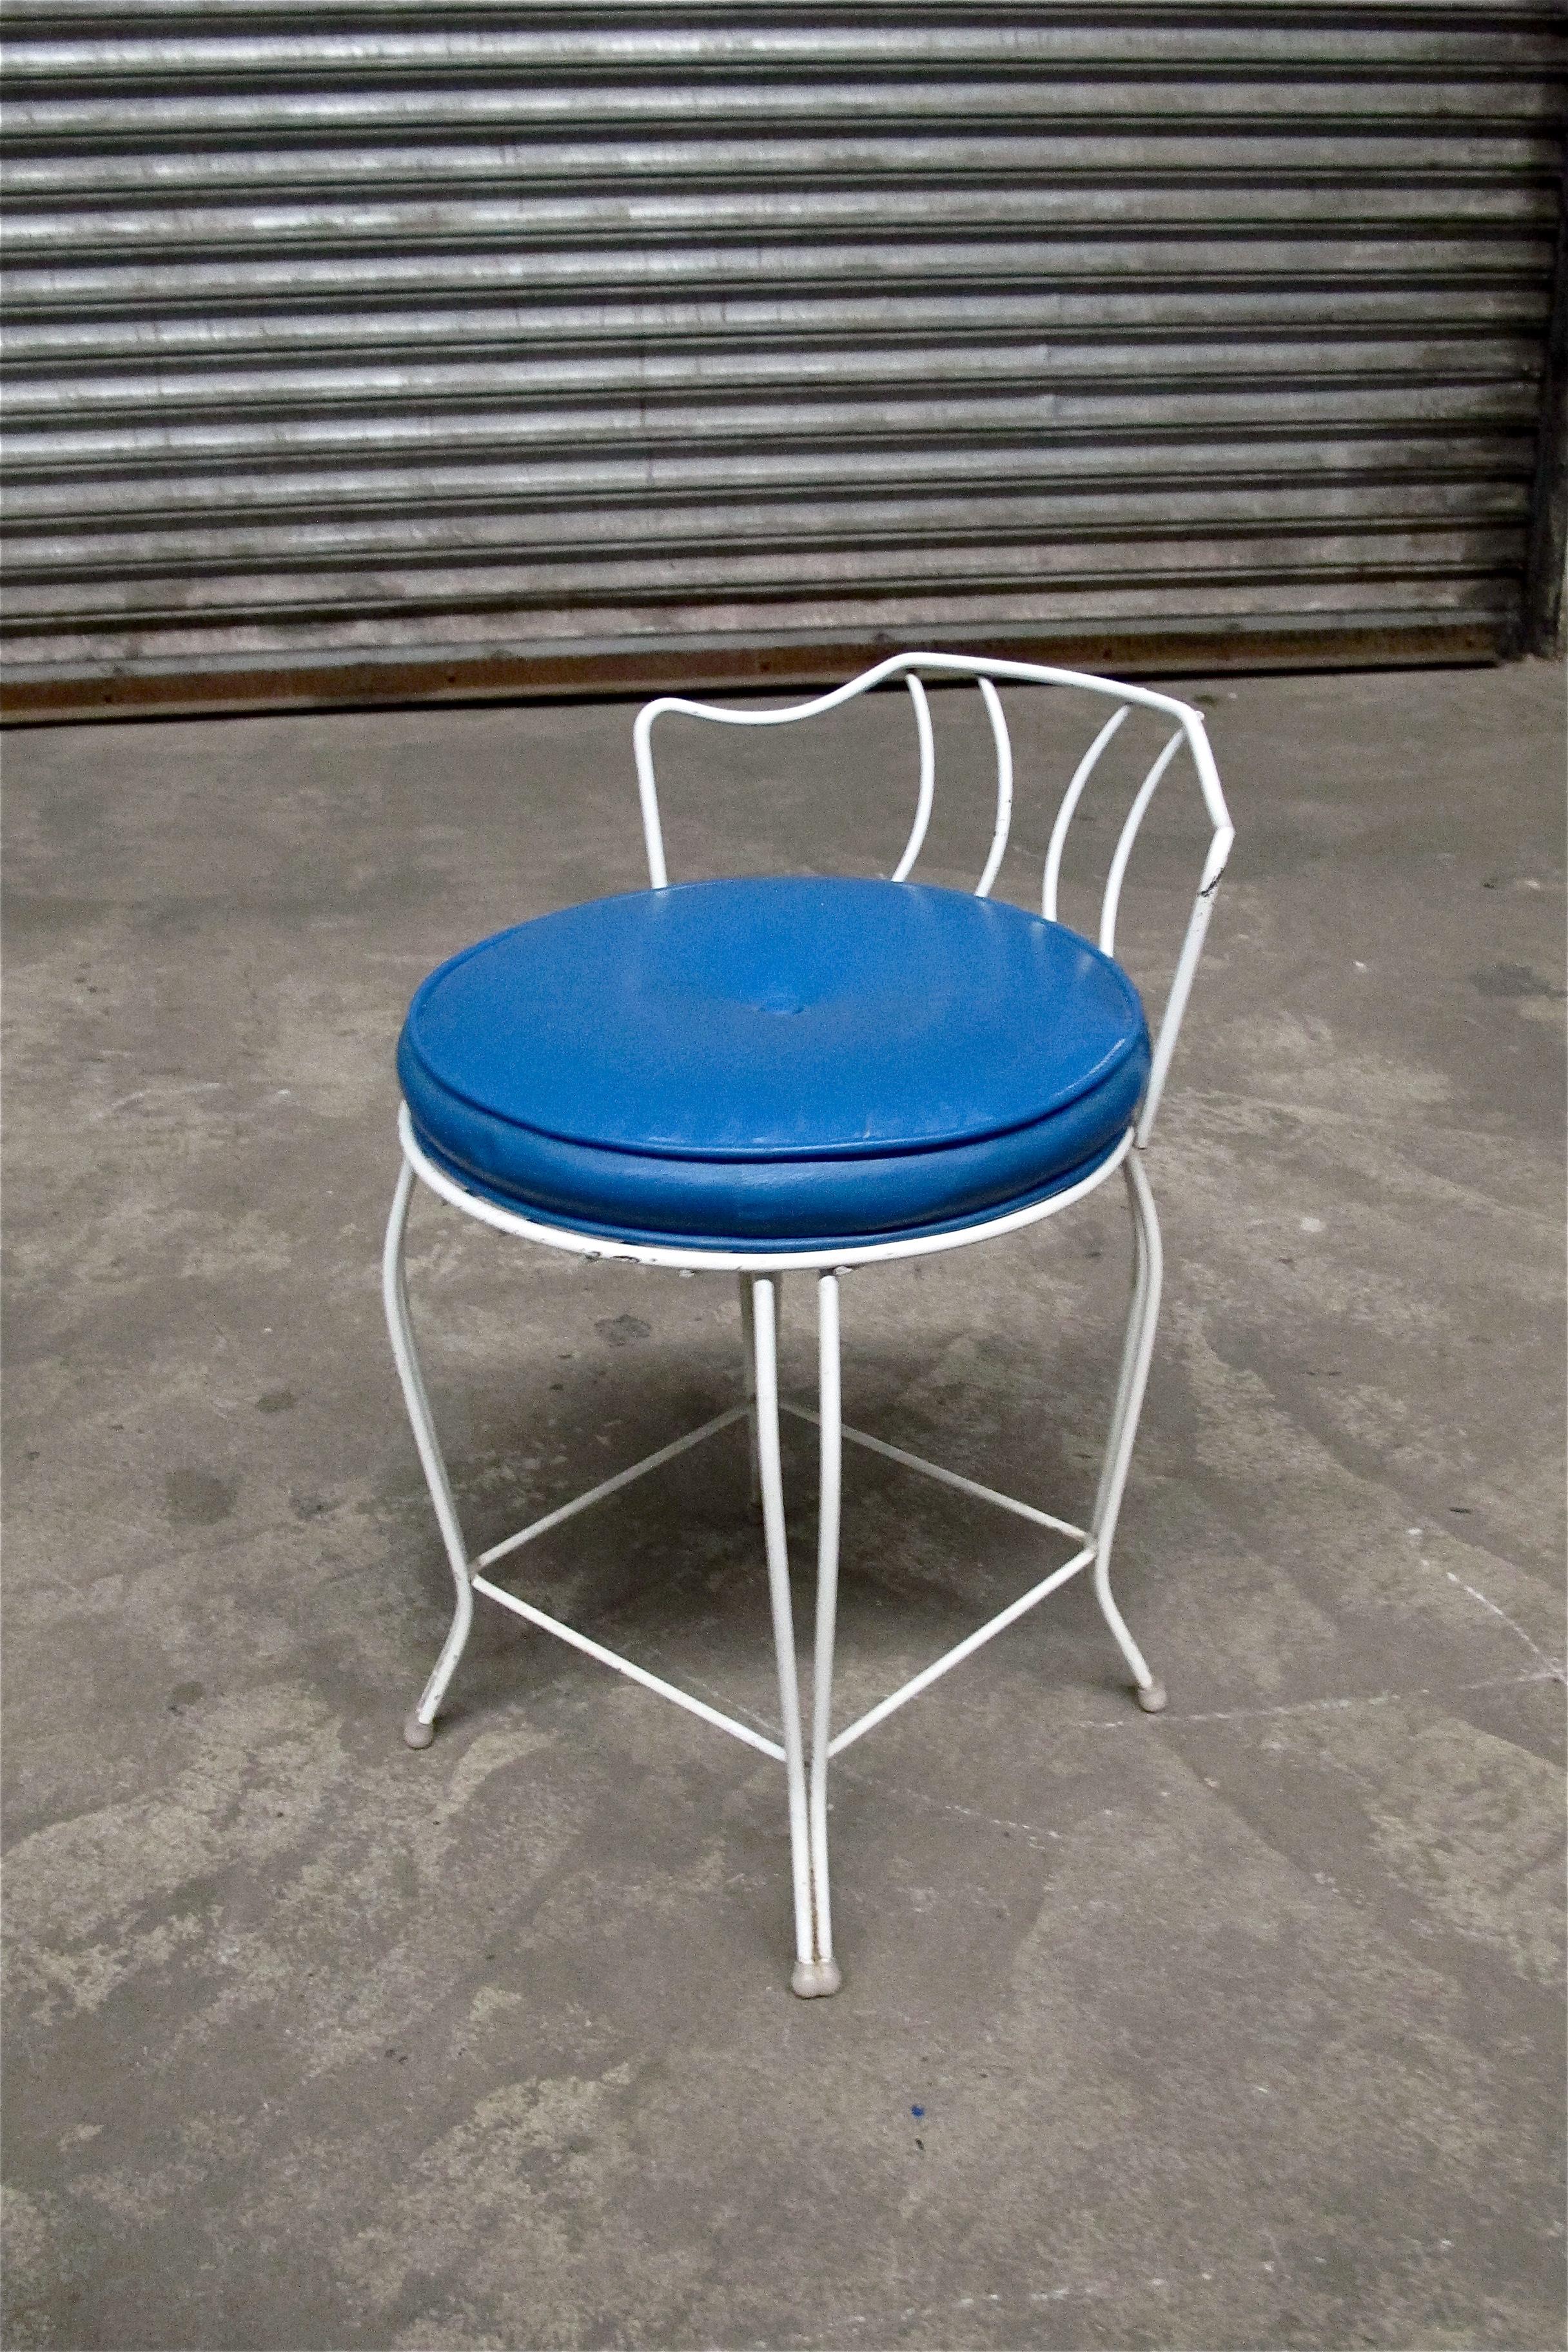 Blue Short White Parlor Chair $35